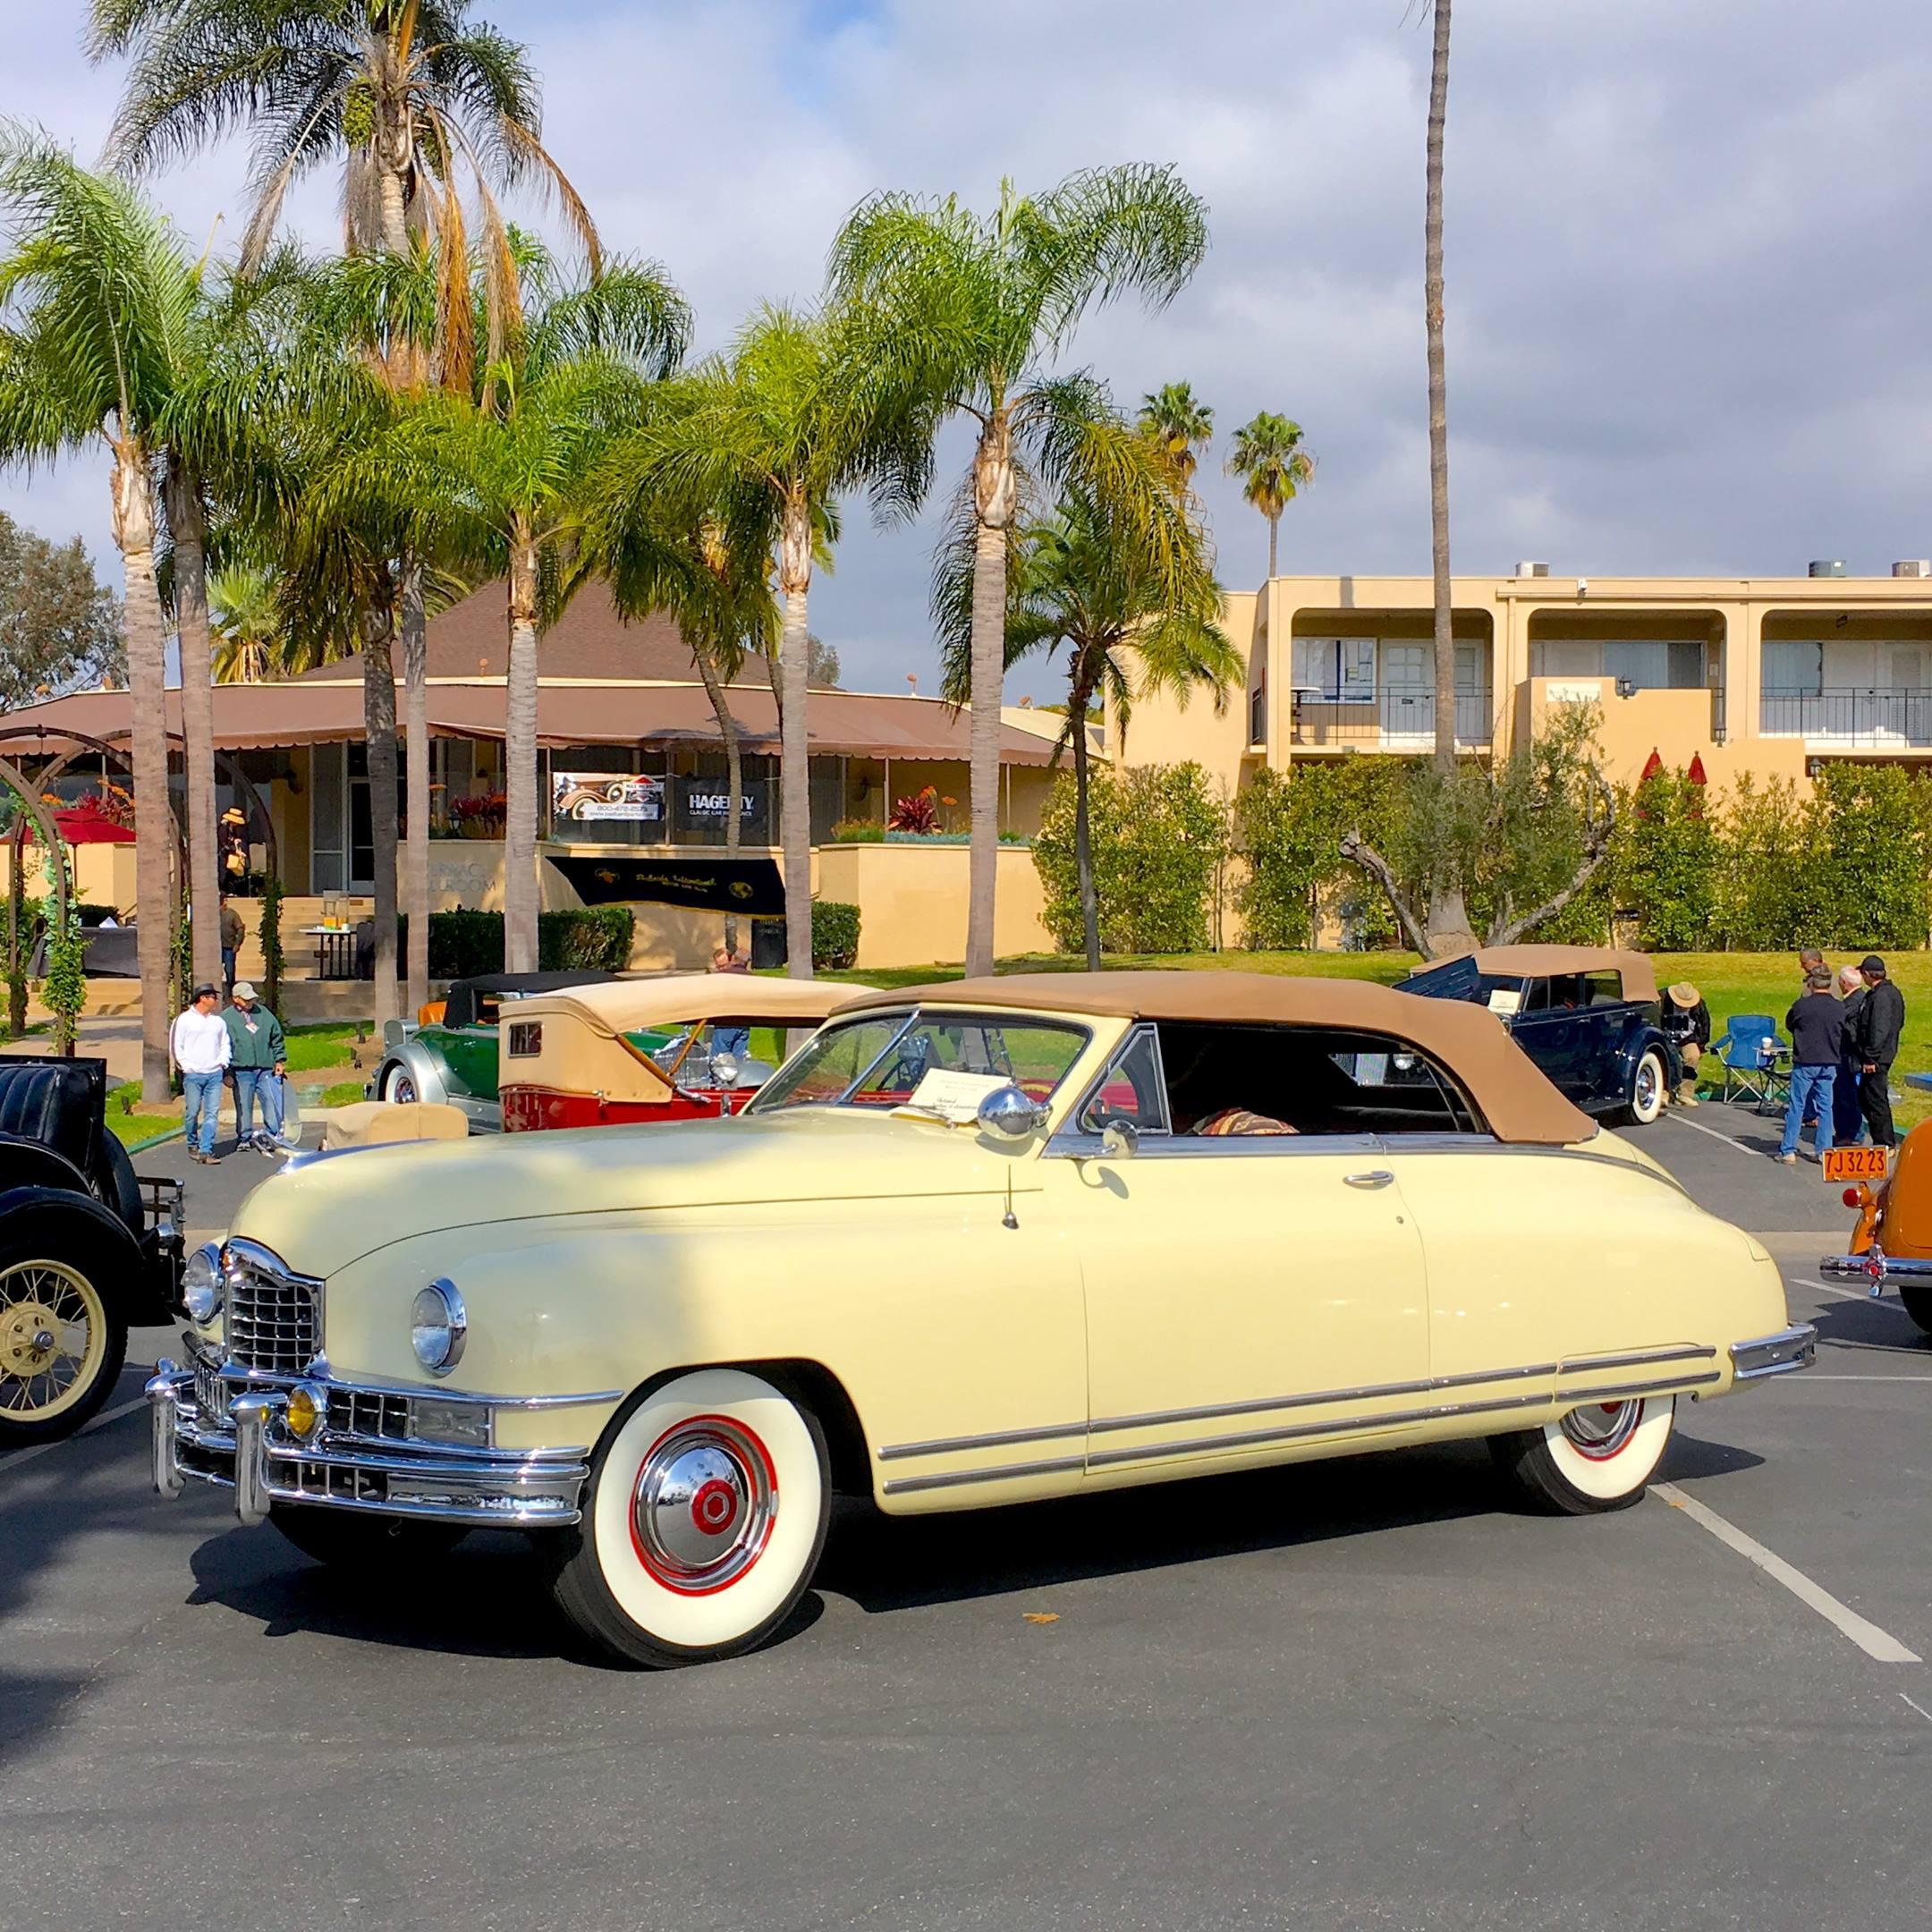 1948 Packard convertible left hand side view